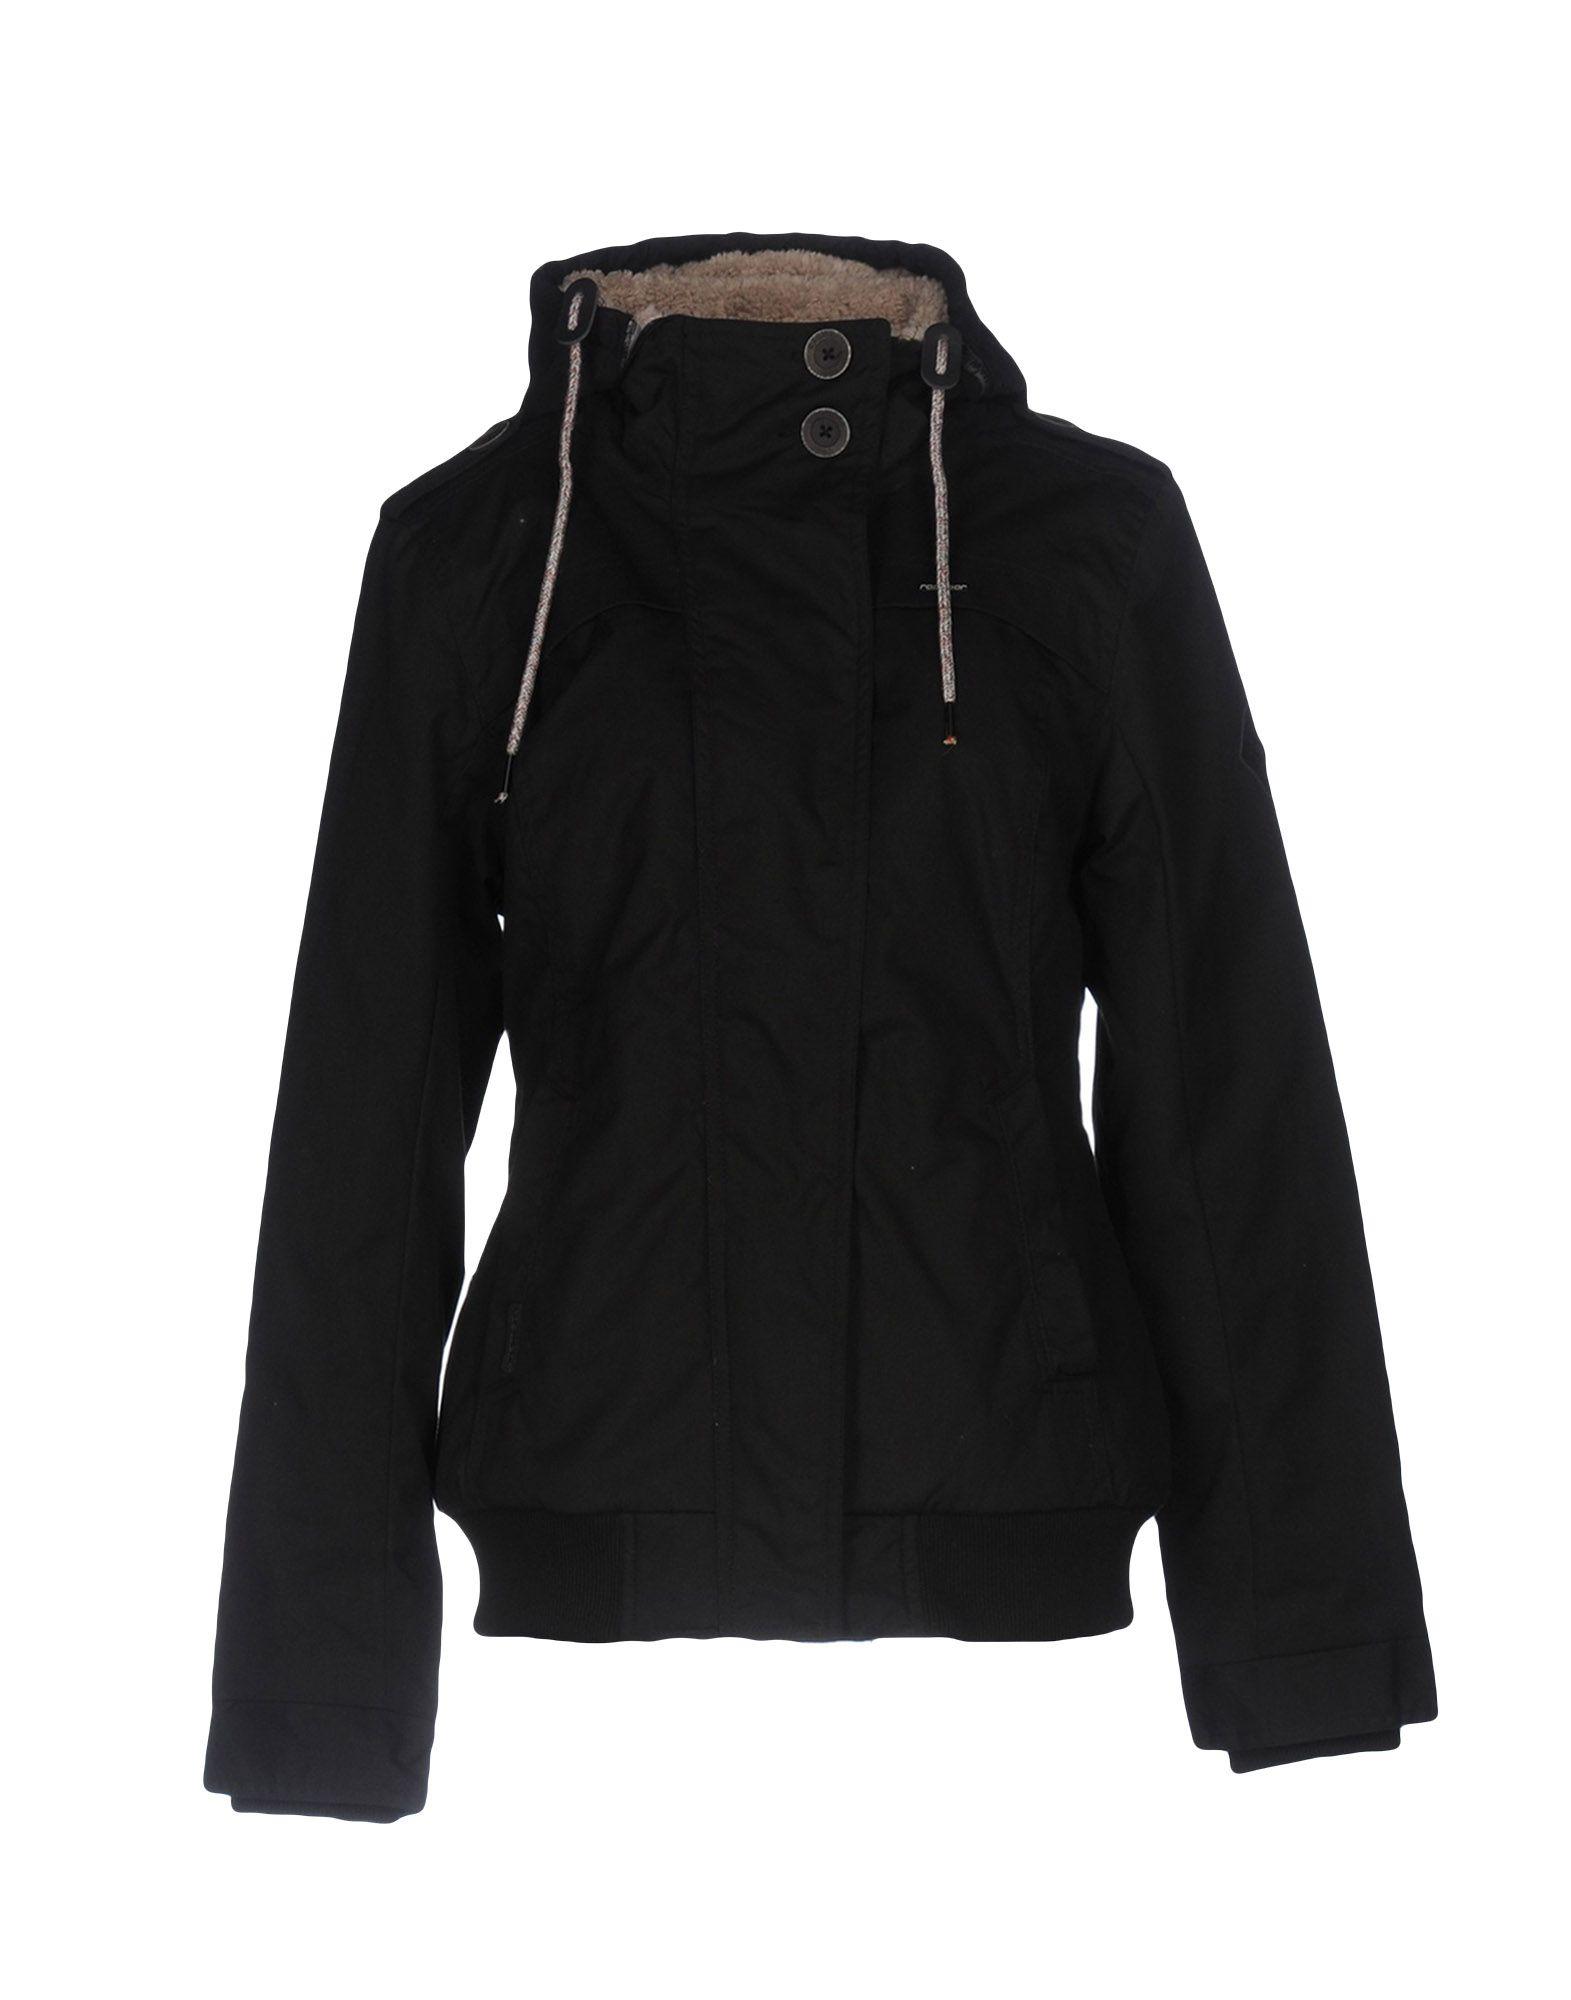 RAGWEAR Damen Jacke Farbe Schwarz Größe 4